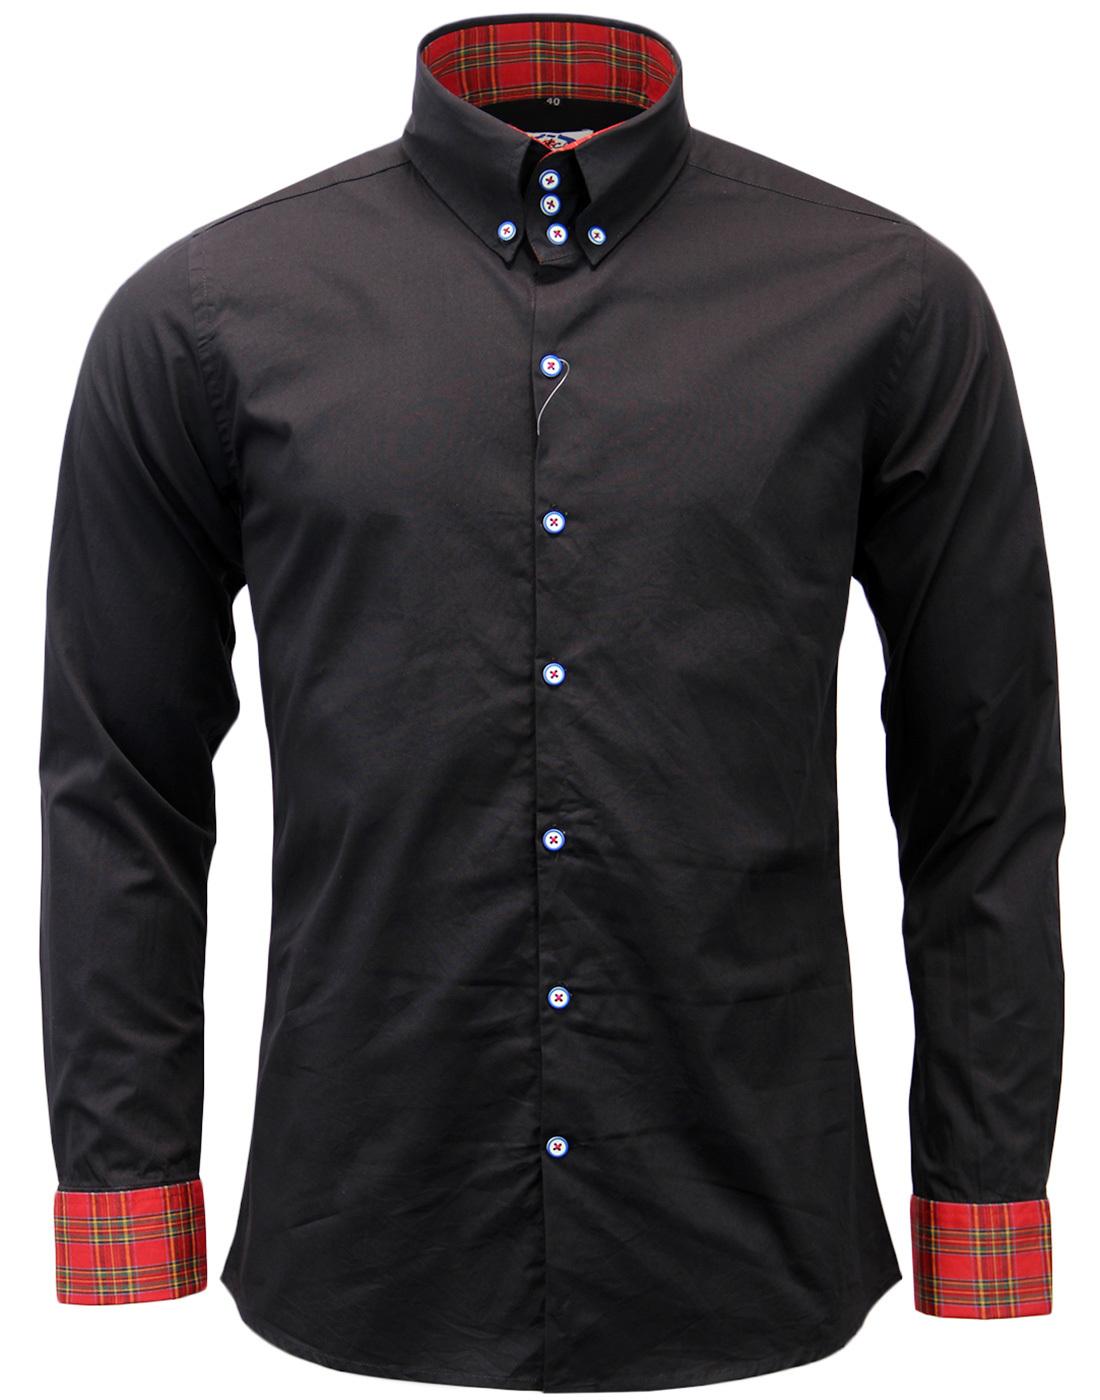 The Whiskey MADCAP ENGLAND High Collar Mod Shirt